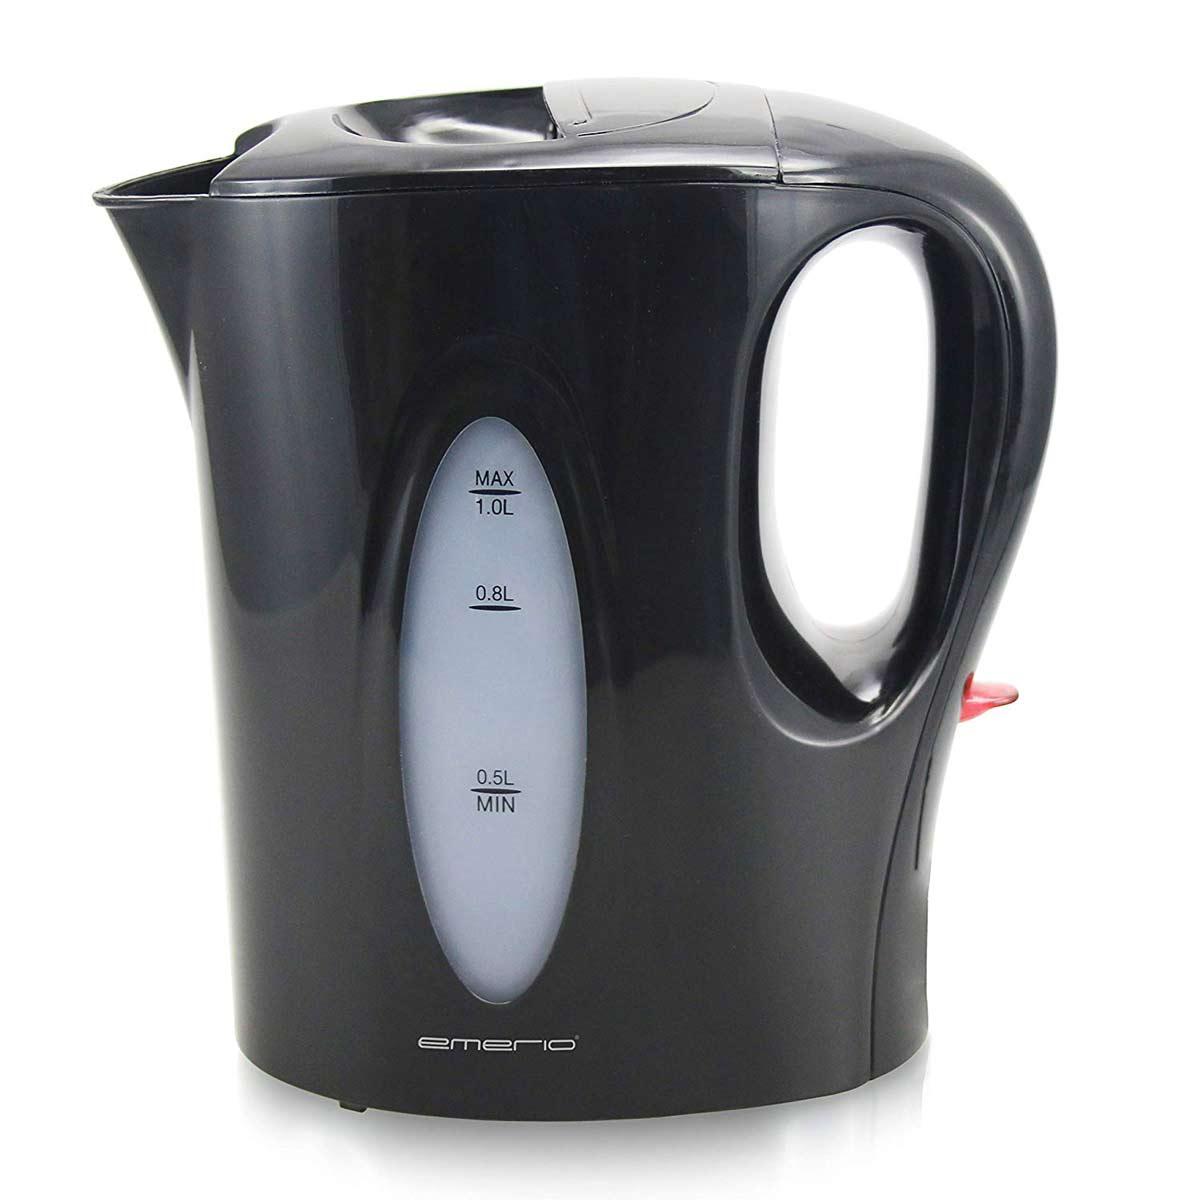 Wasserkocher schwarz 1200 Watt Emerio WK-114814.1 – Bild 1